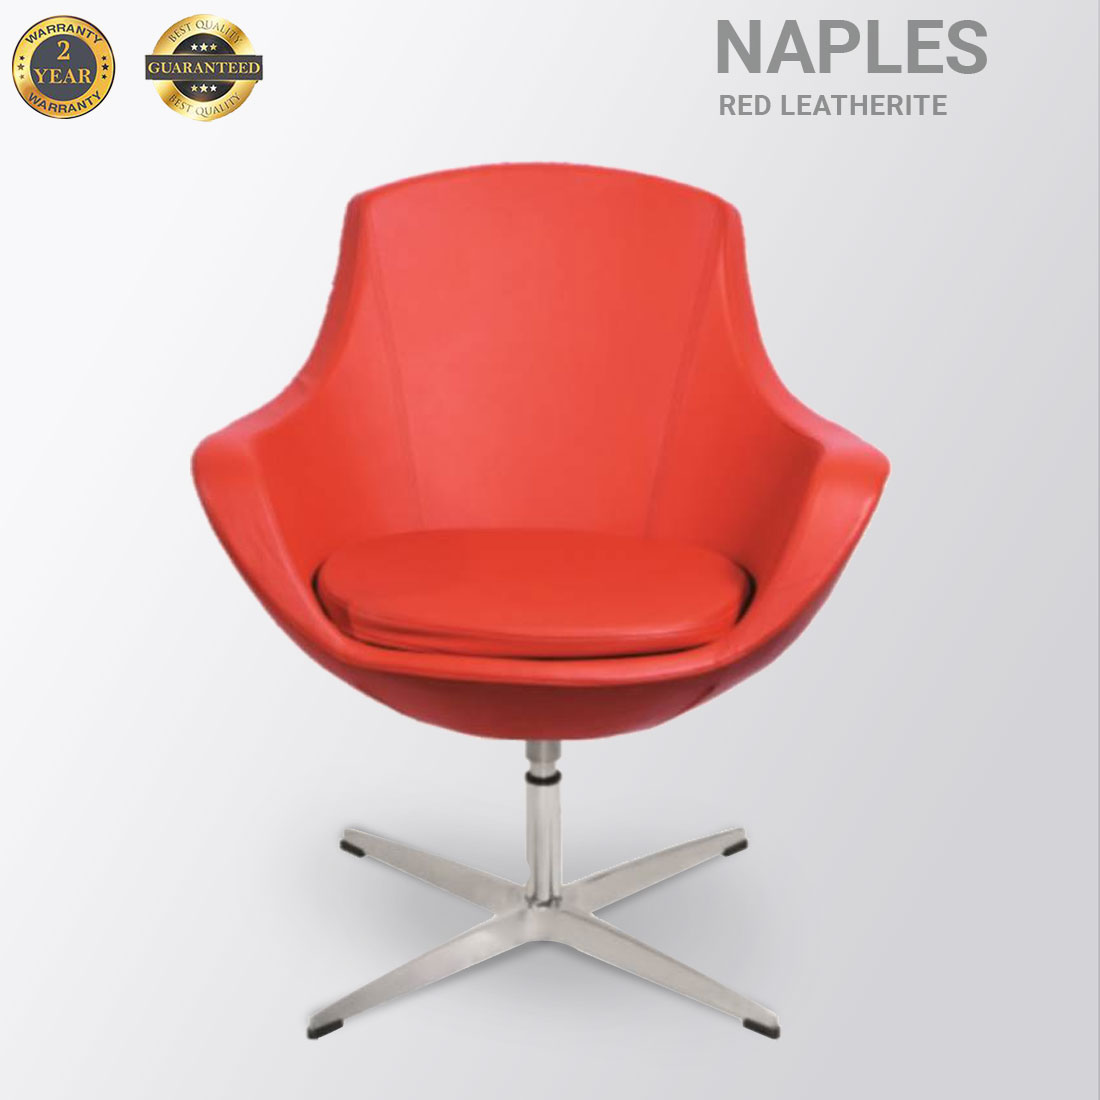 NAPLES LEATHERITE  RED